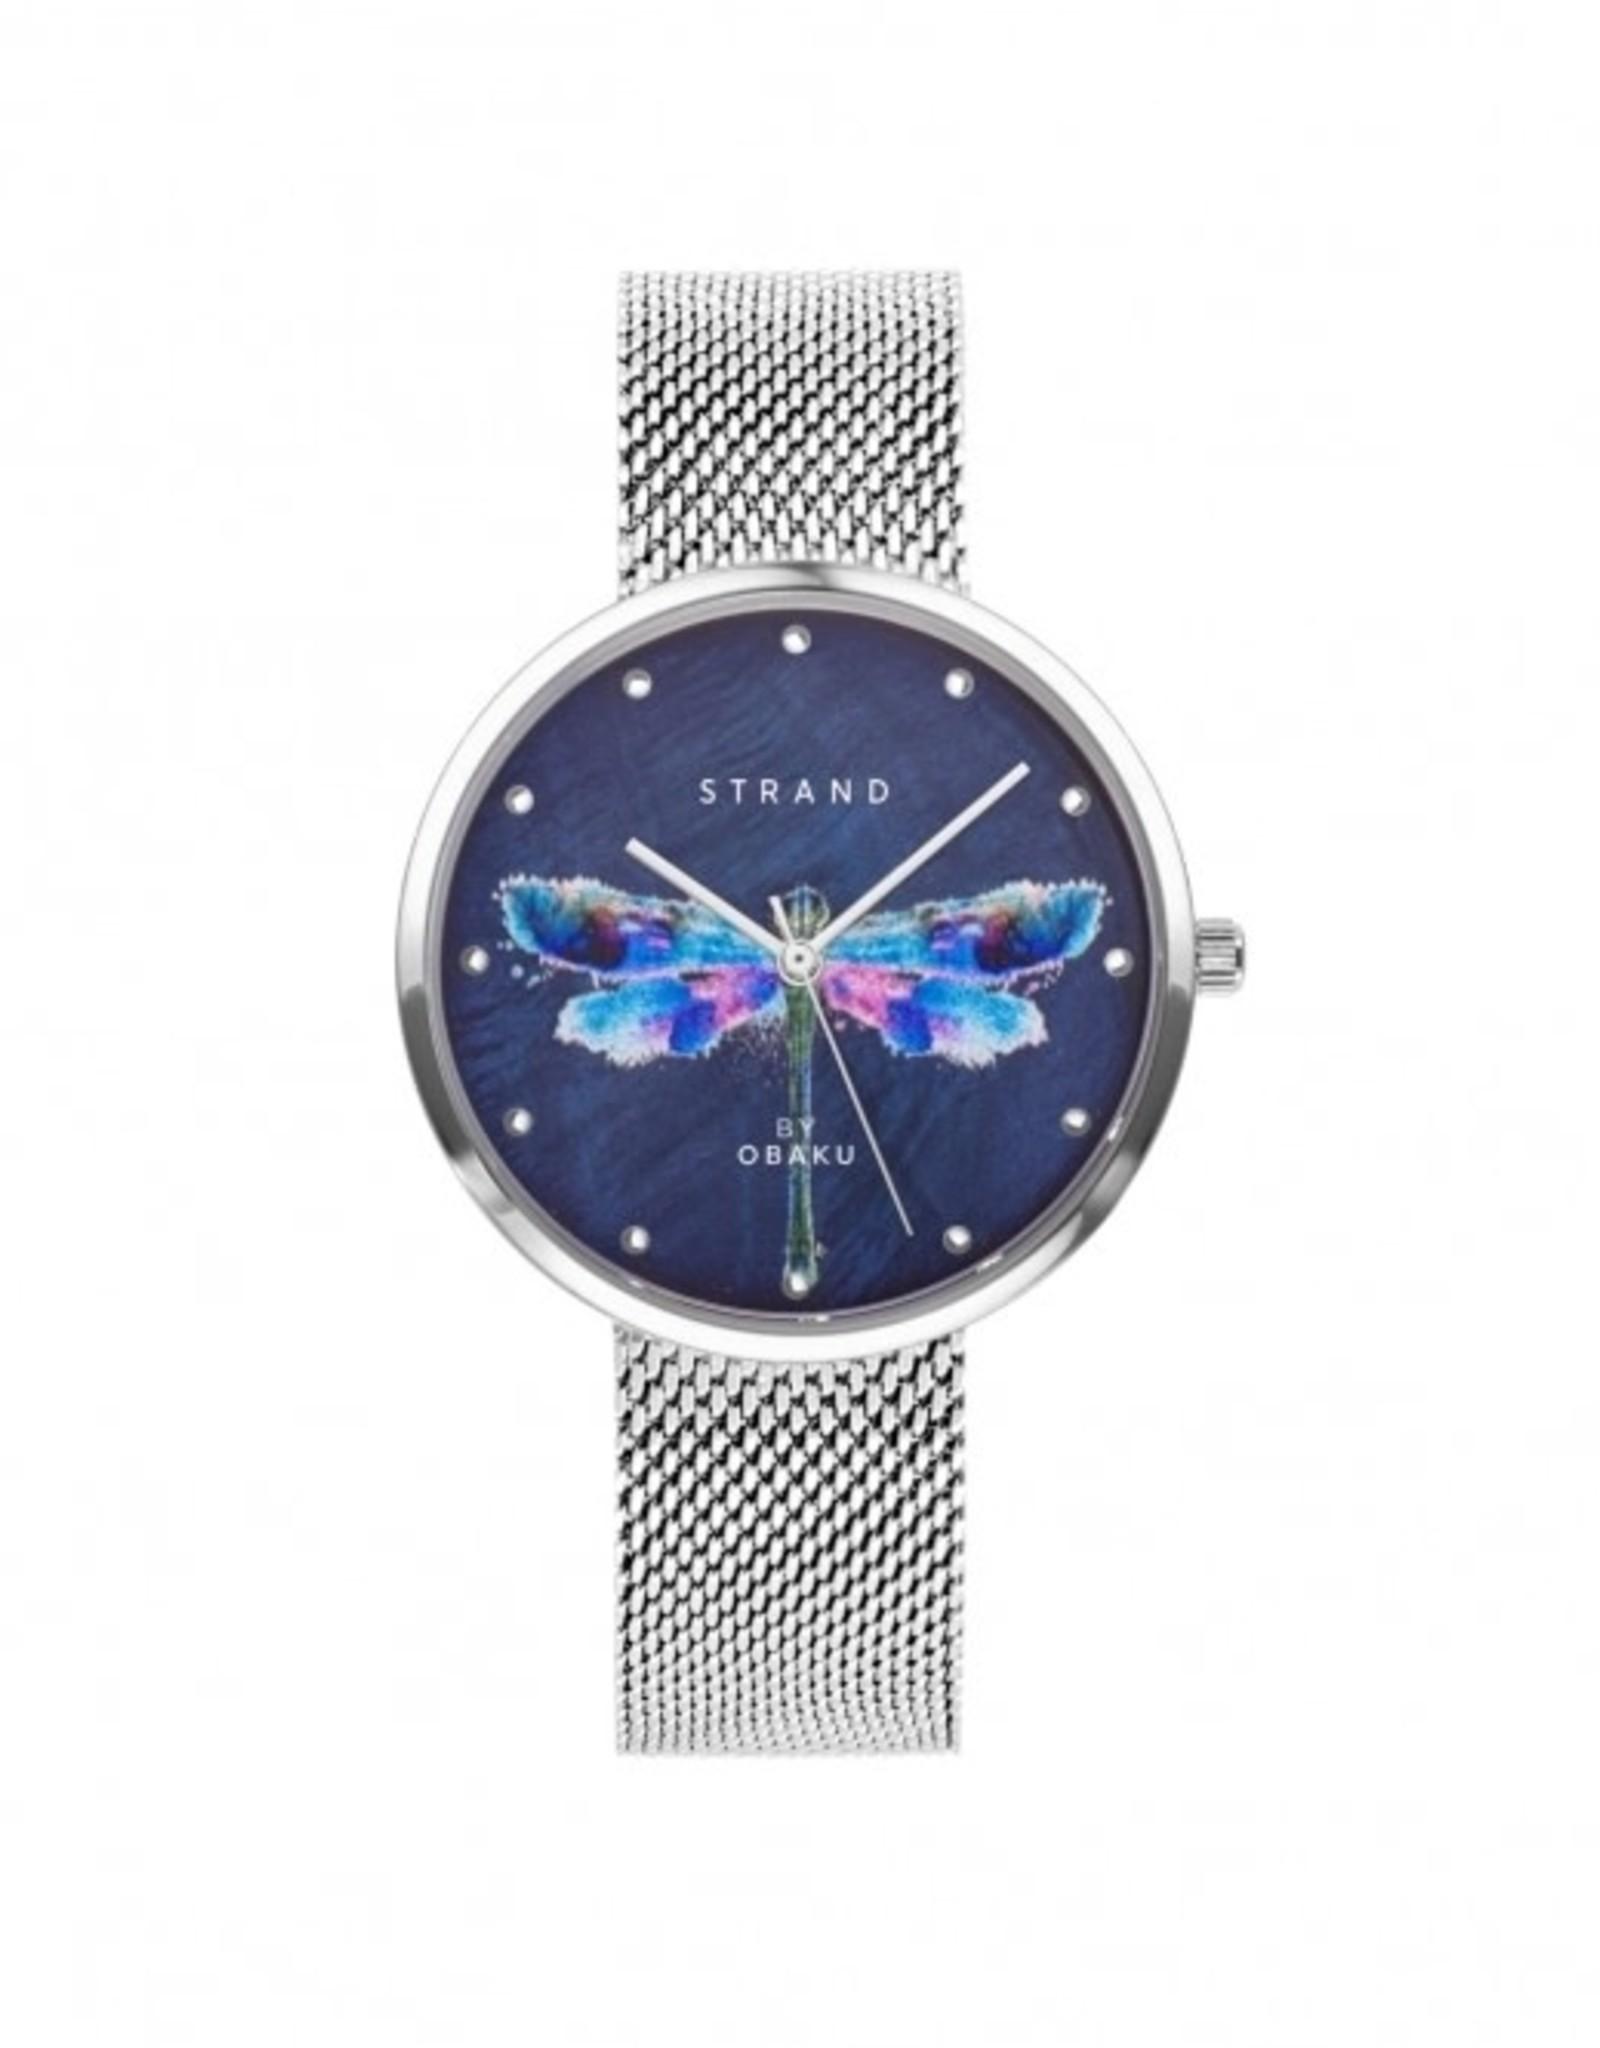 Strand by Obaku Montre Dragonfly - Argent & bleu